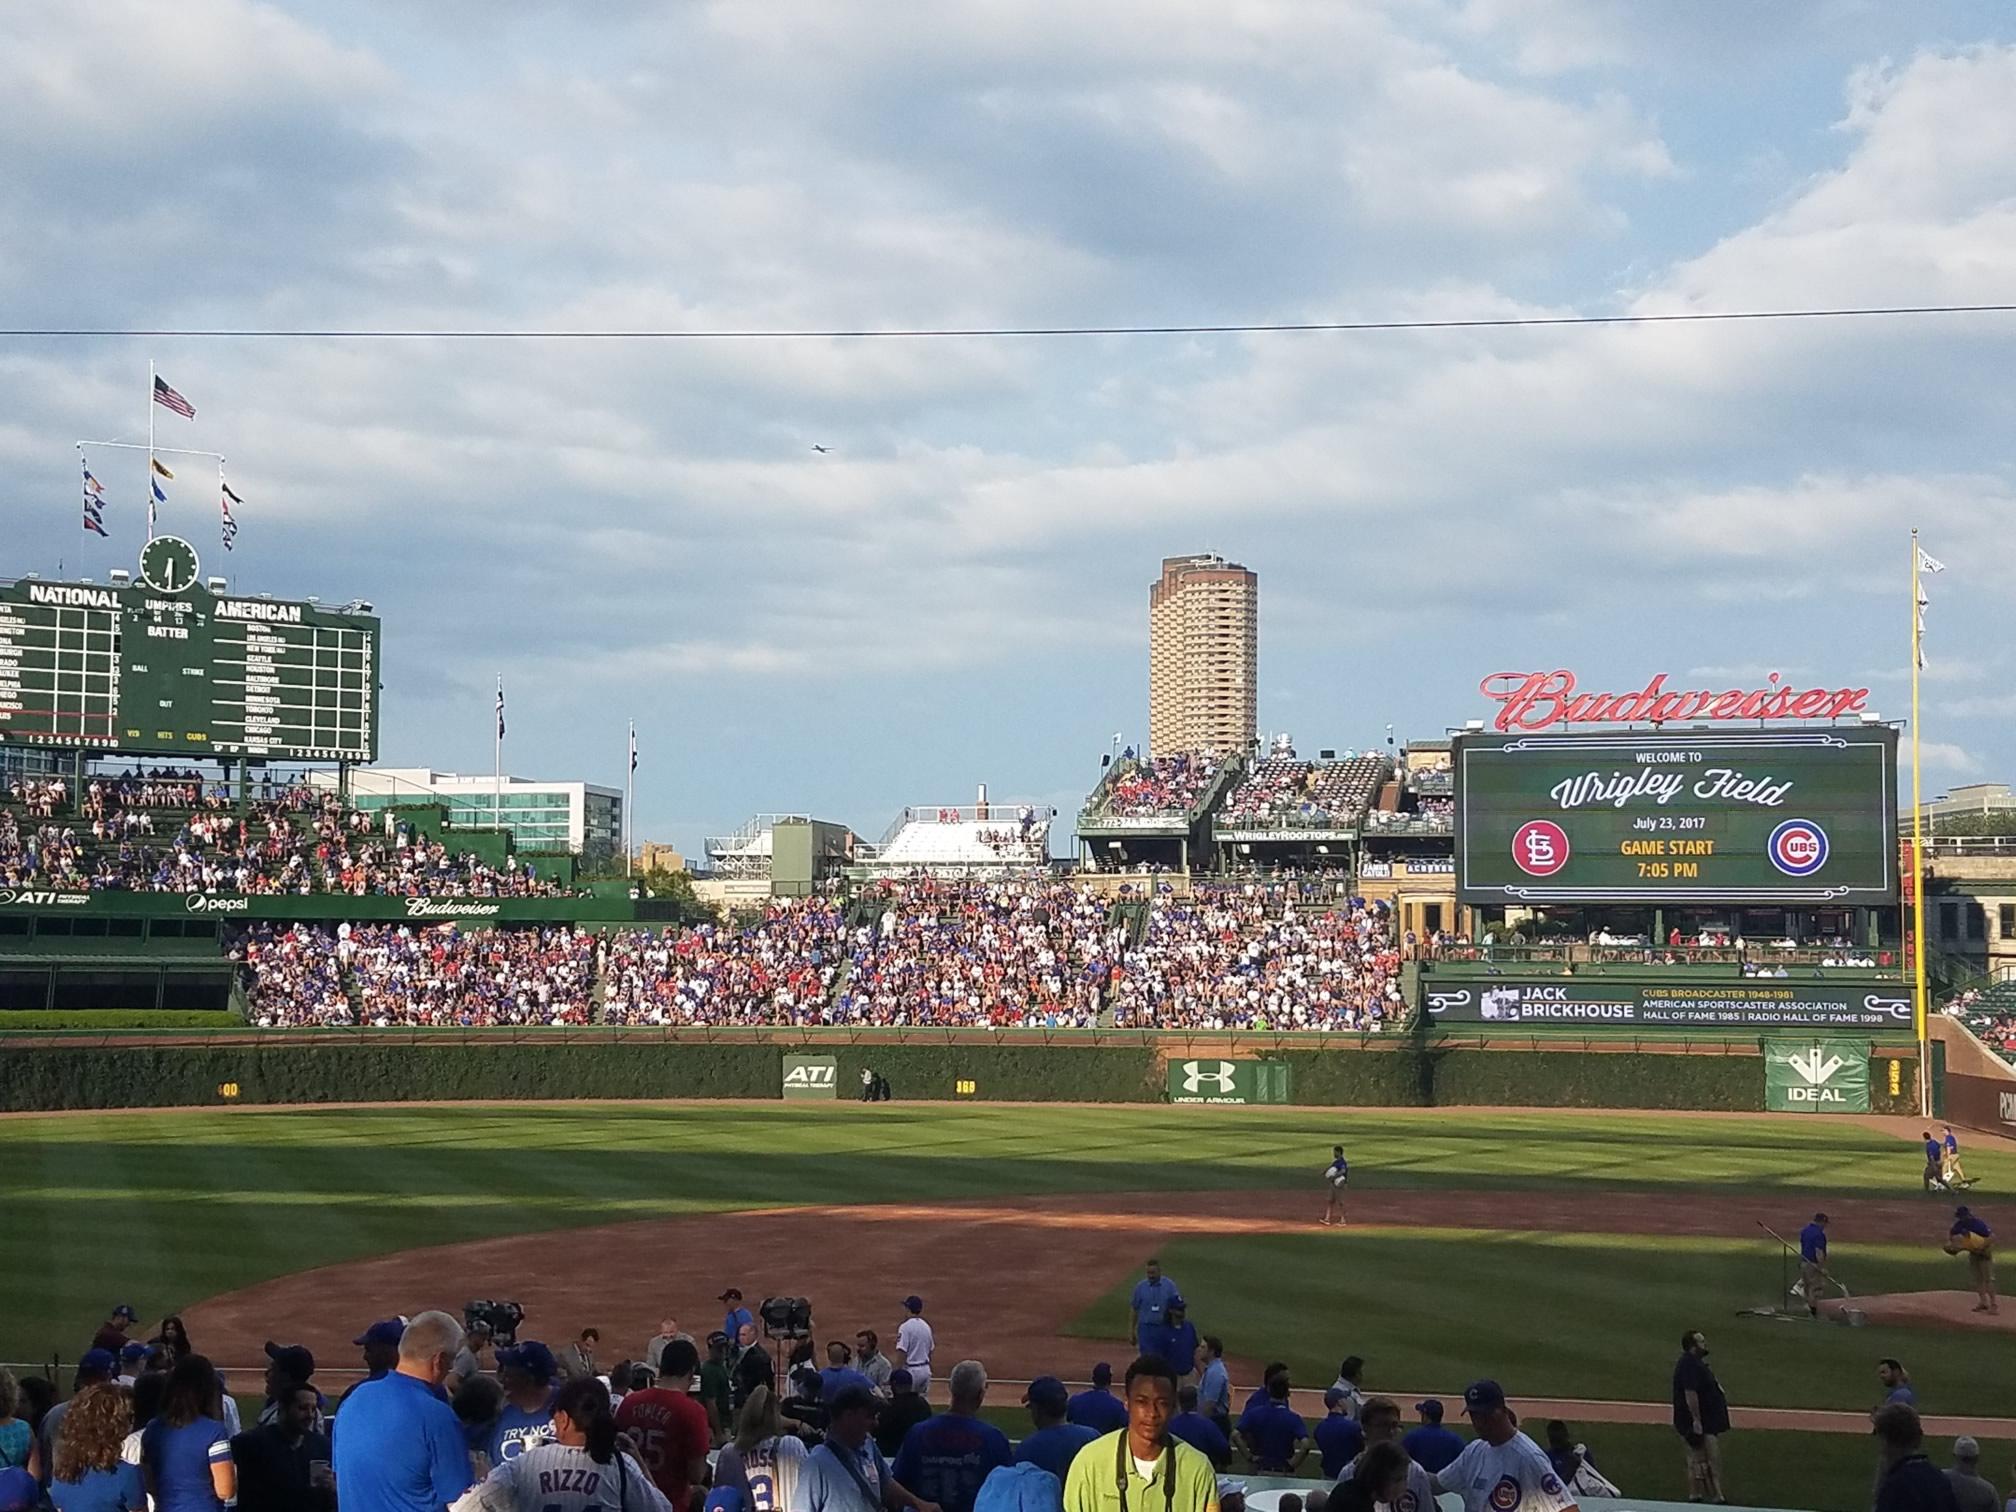 Wrigley Field Bleachers Baseball Seating Rateyourseatscom